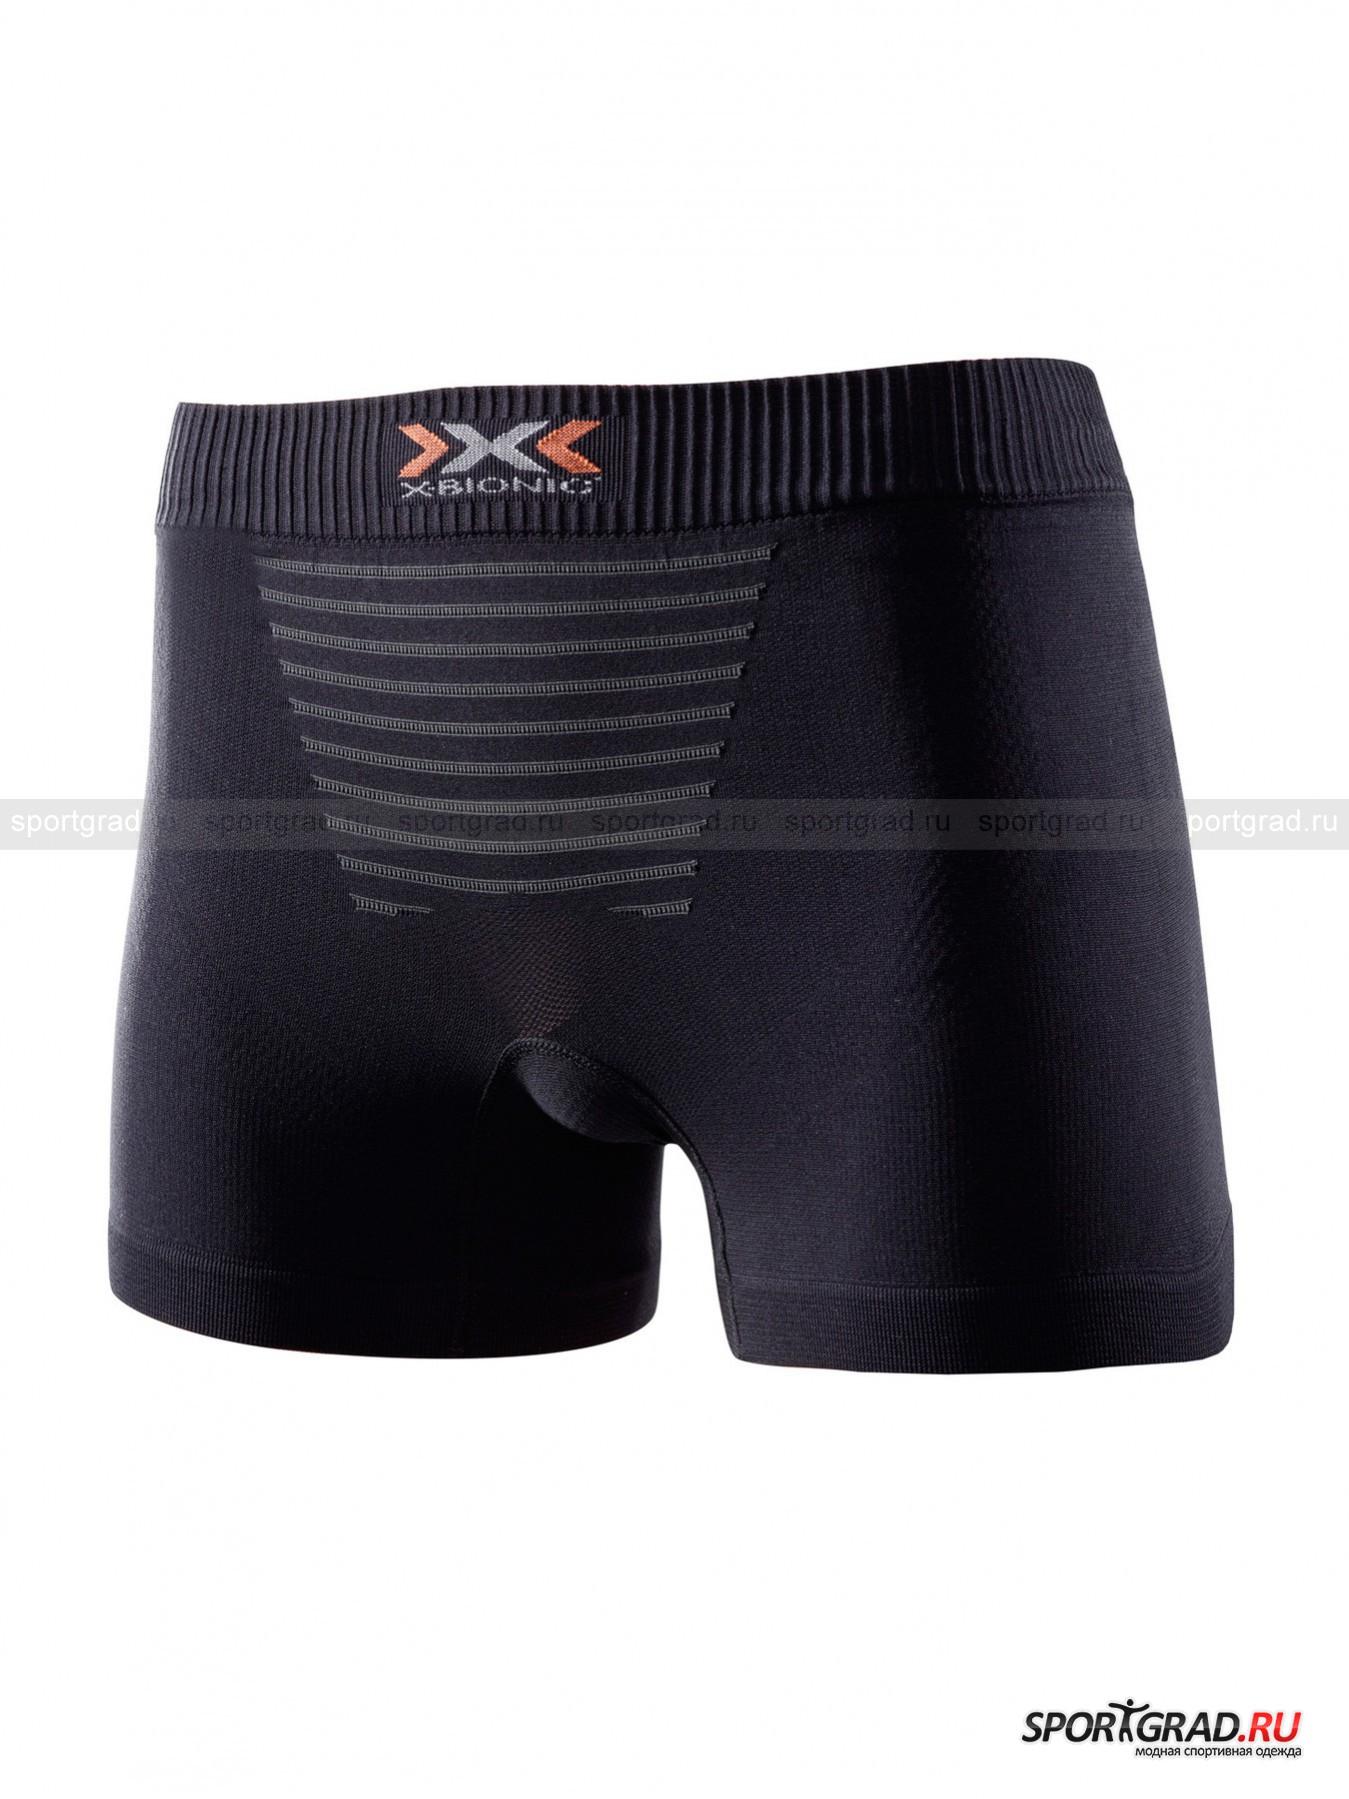 Белье: термобоксеры женские UNDERWEAR INVENT LT UW BOXER X-BIO для занятий спортом